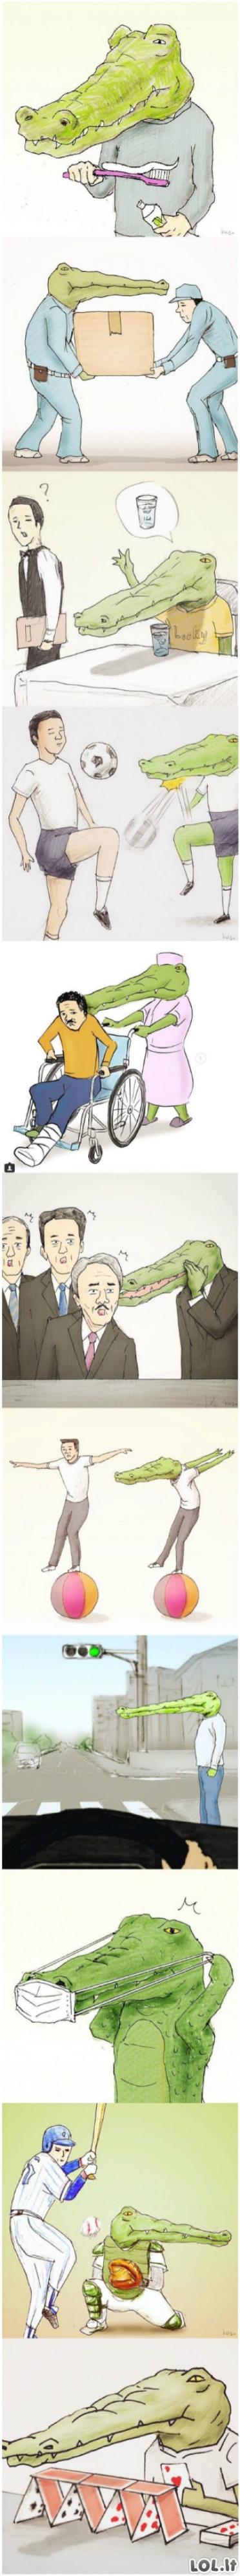 Sunkus krokodilo gyvenimas II dalis